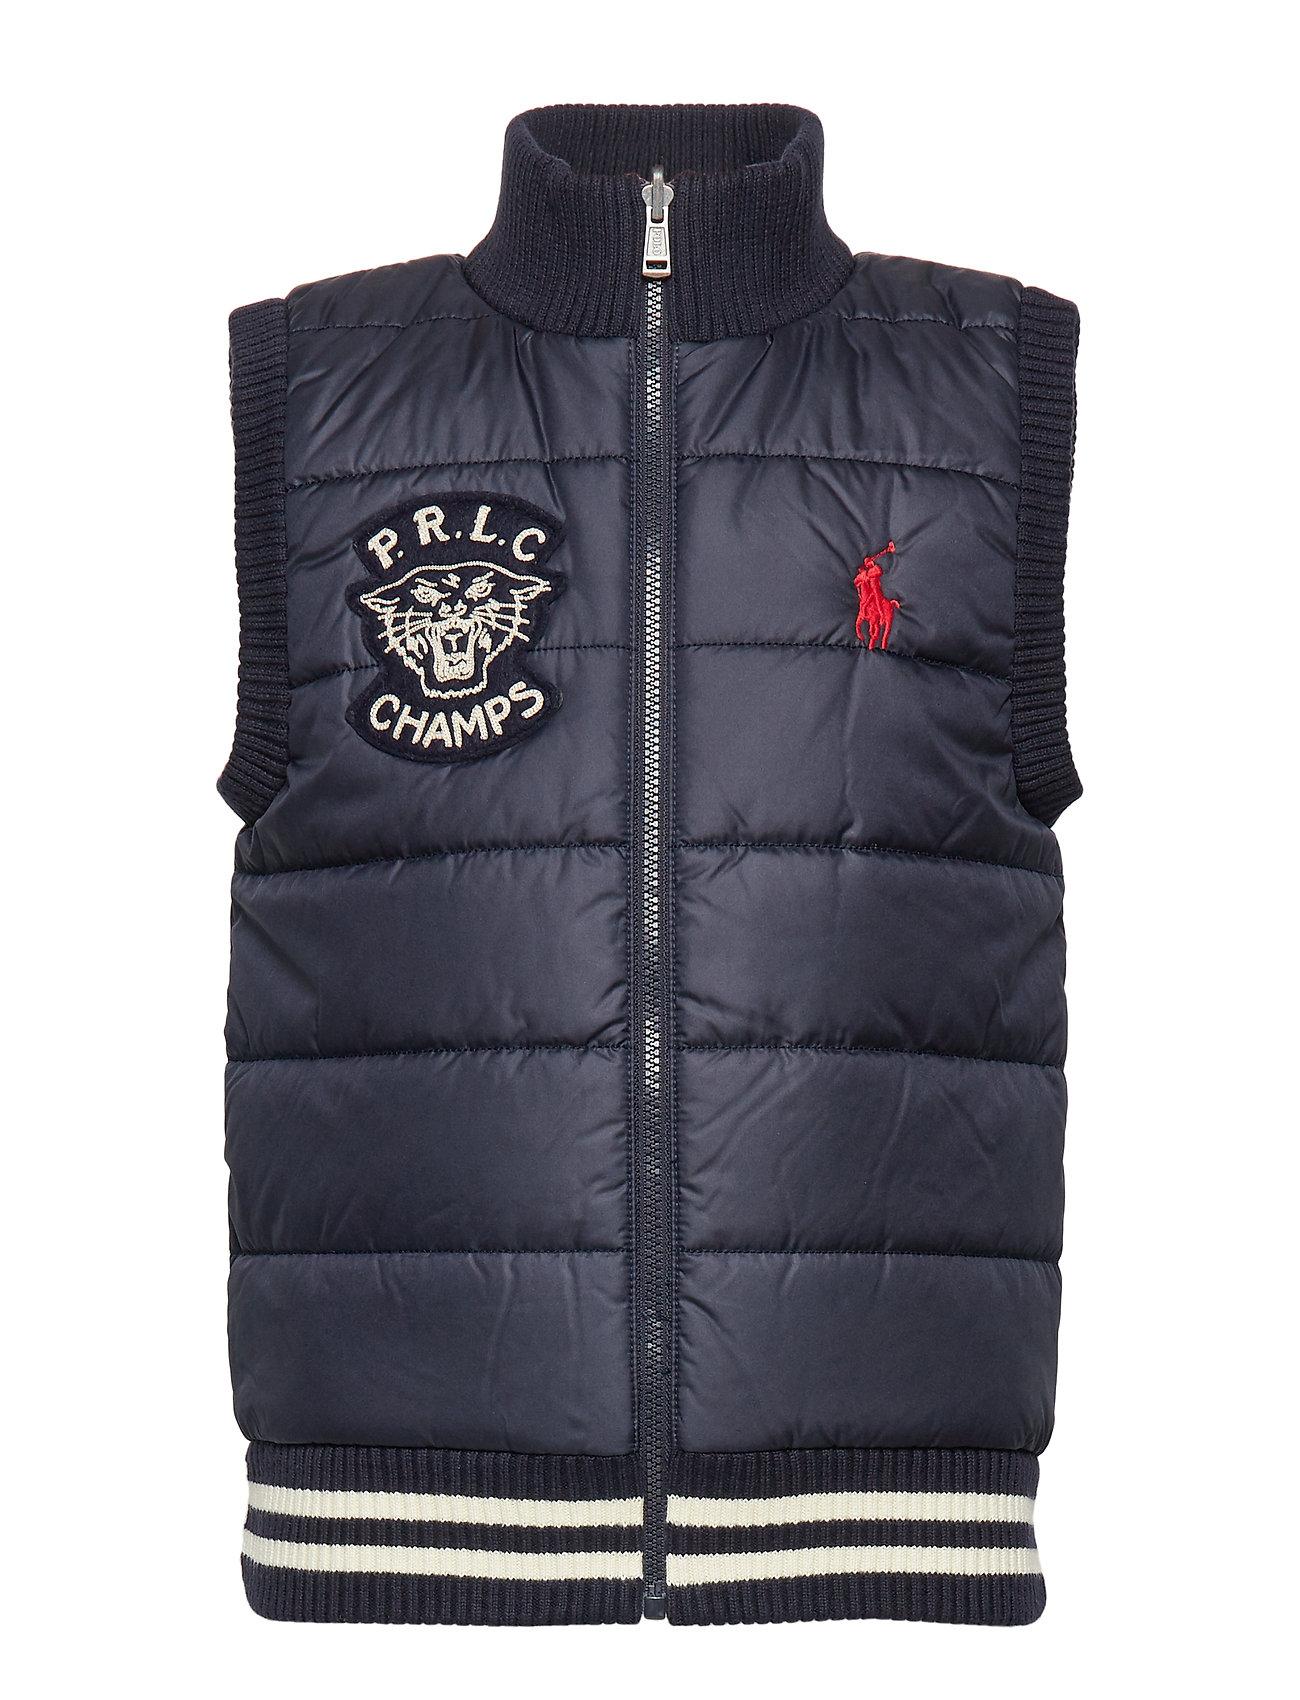 Ralph Lauren Kids Reversible Sweater Vest - RL NAVY MULTI